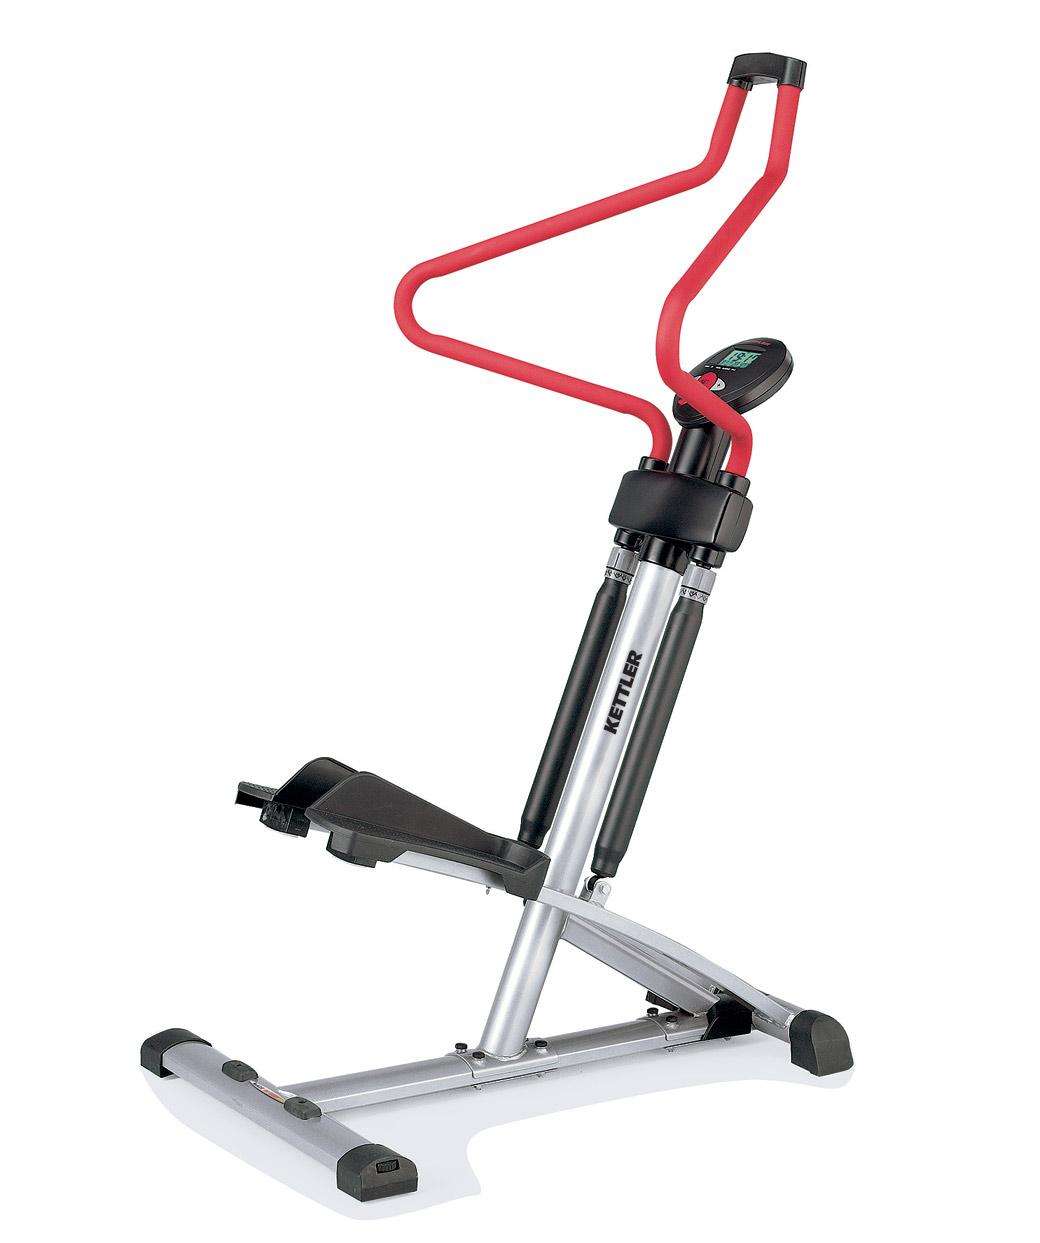 Тренажёр для раздвигания ног 15 фотография